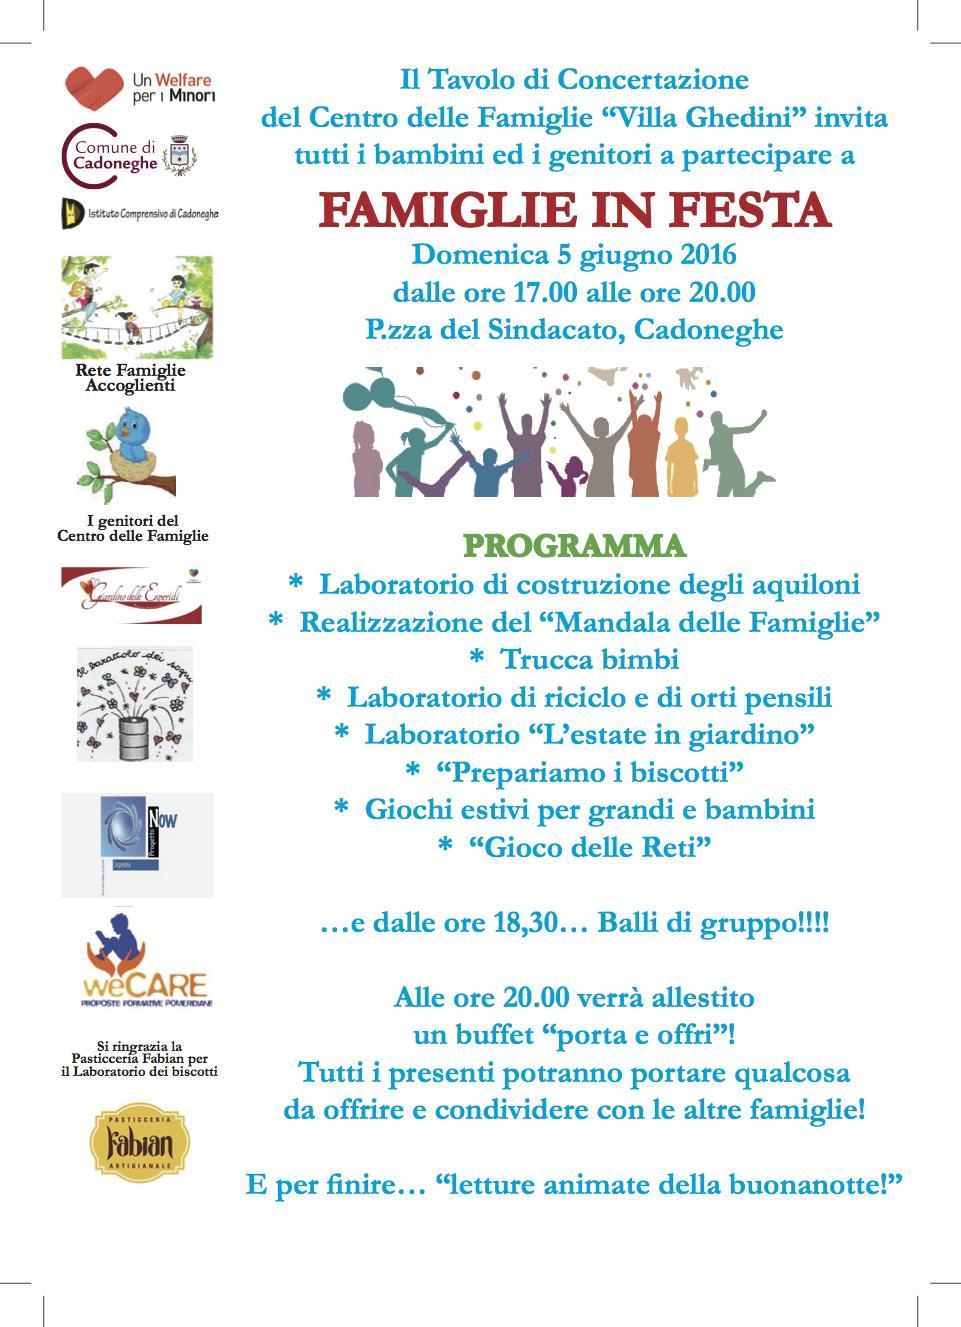 20160605.cadoneghe.festafamiglie.1